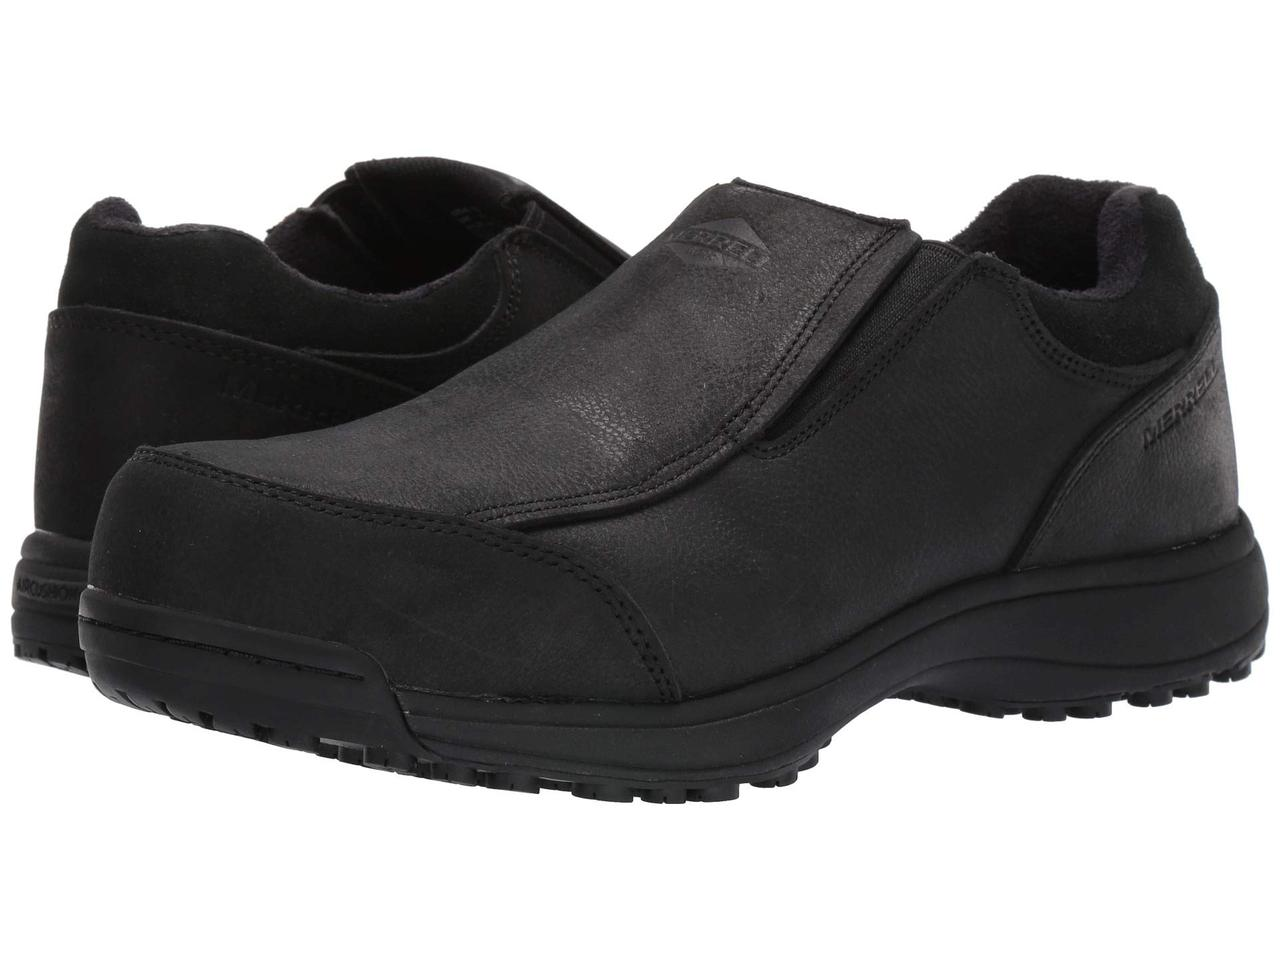 Кроссовки/Кеды (Оригинал) Merrell Work Sutton Moc Steel Toe Black